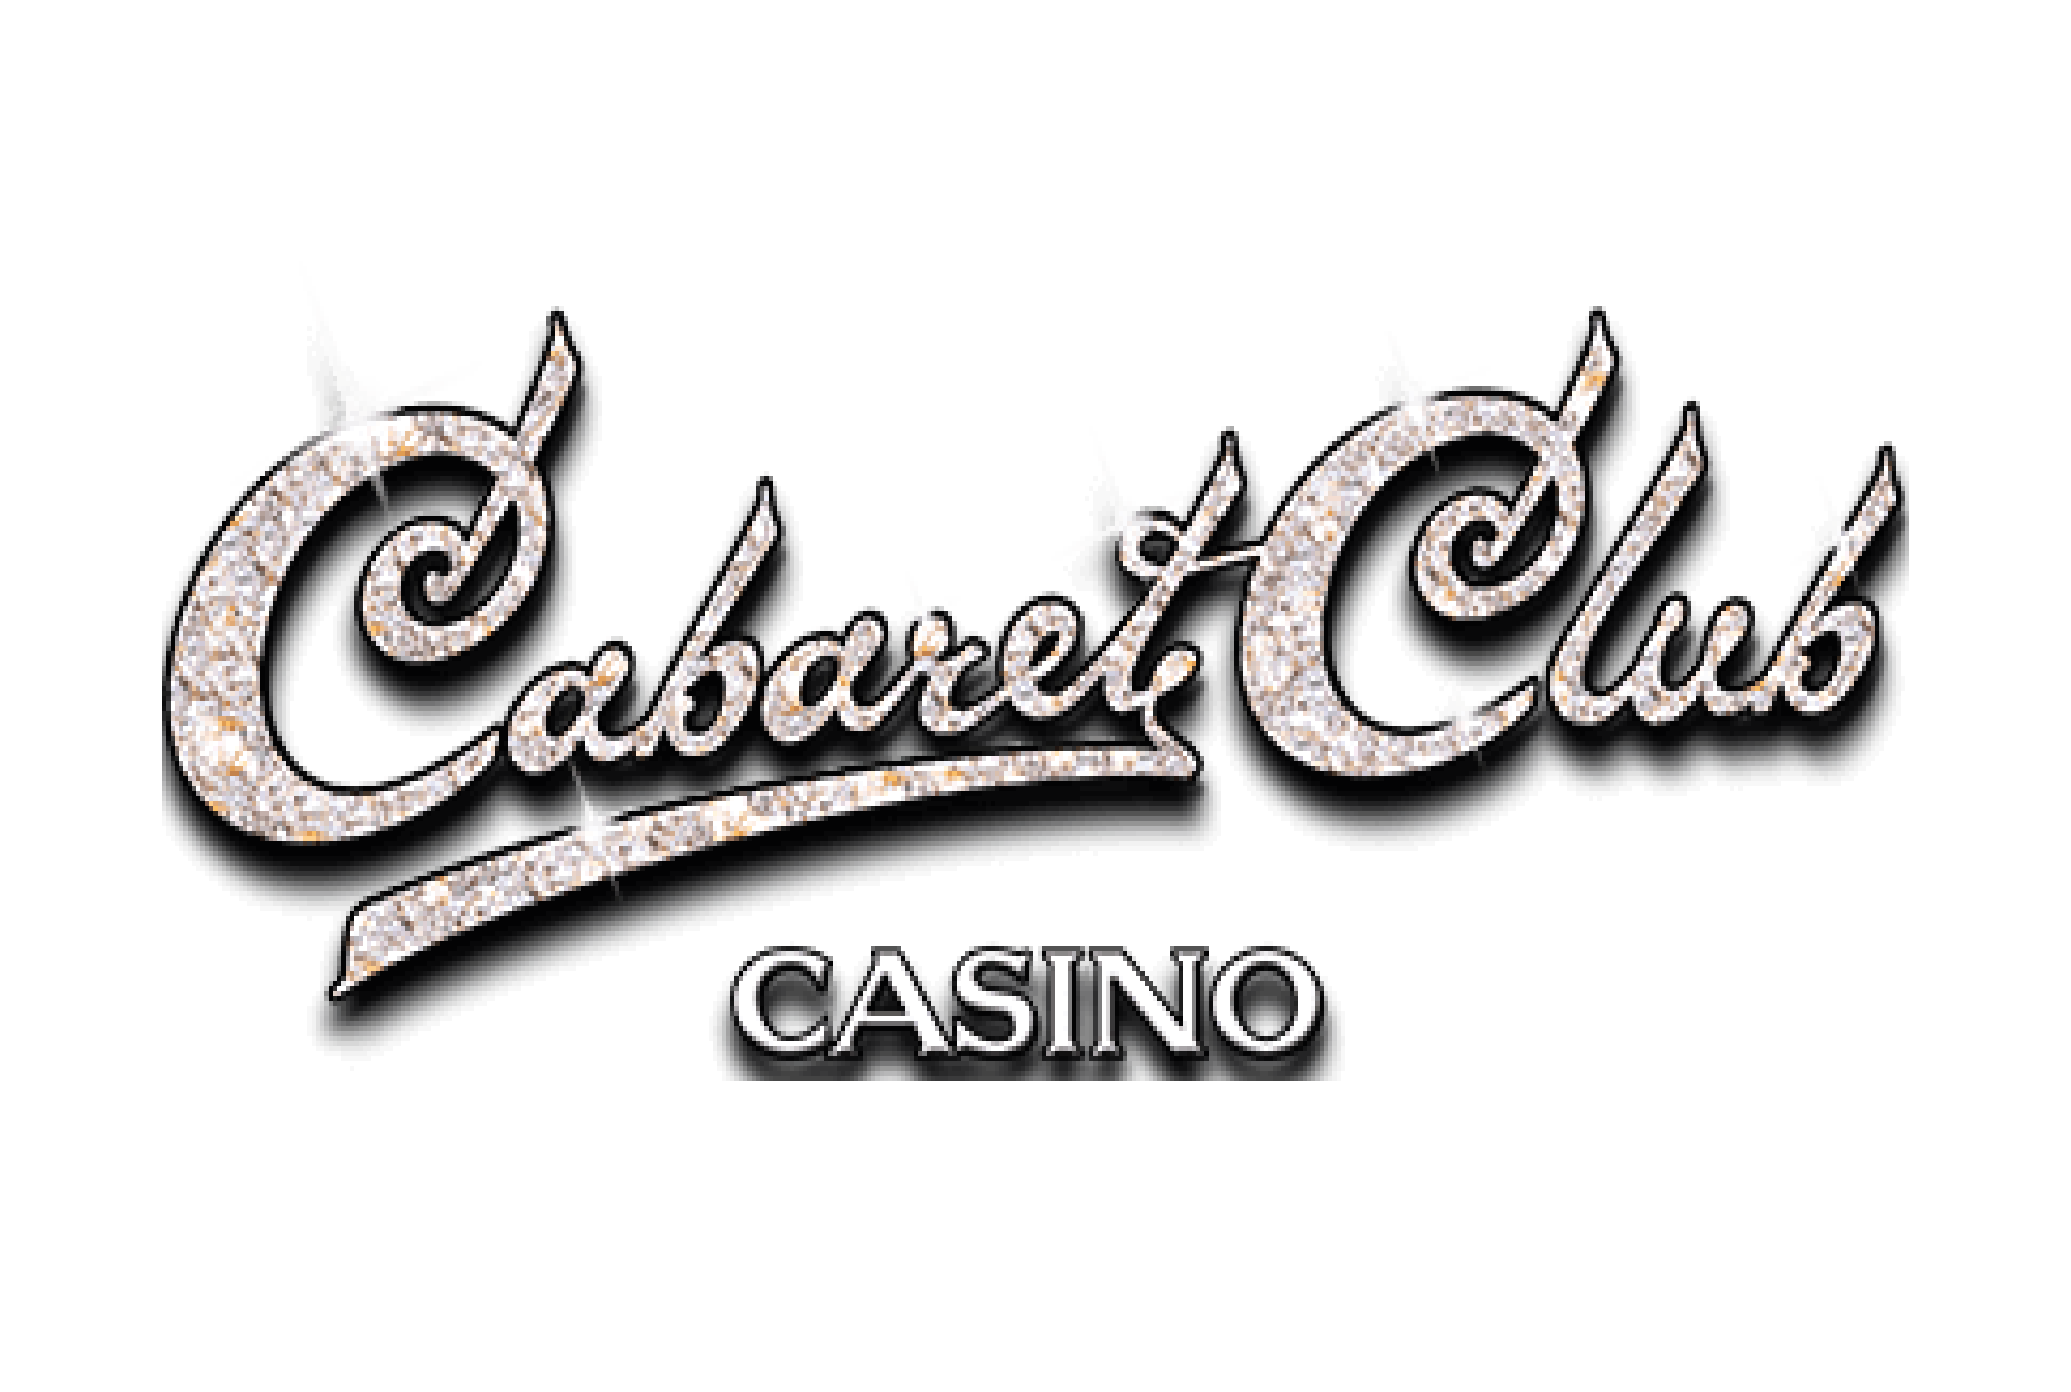 cabaretclub-logo-01